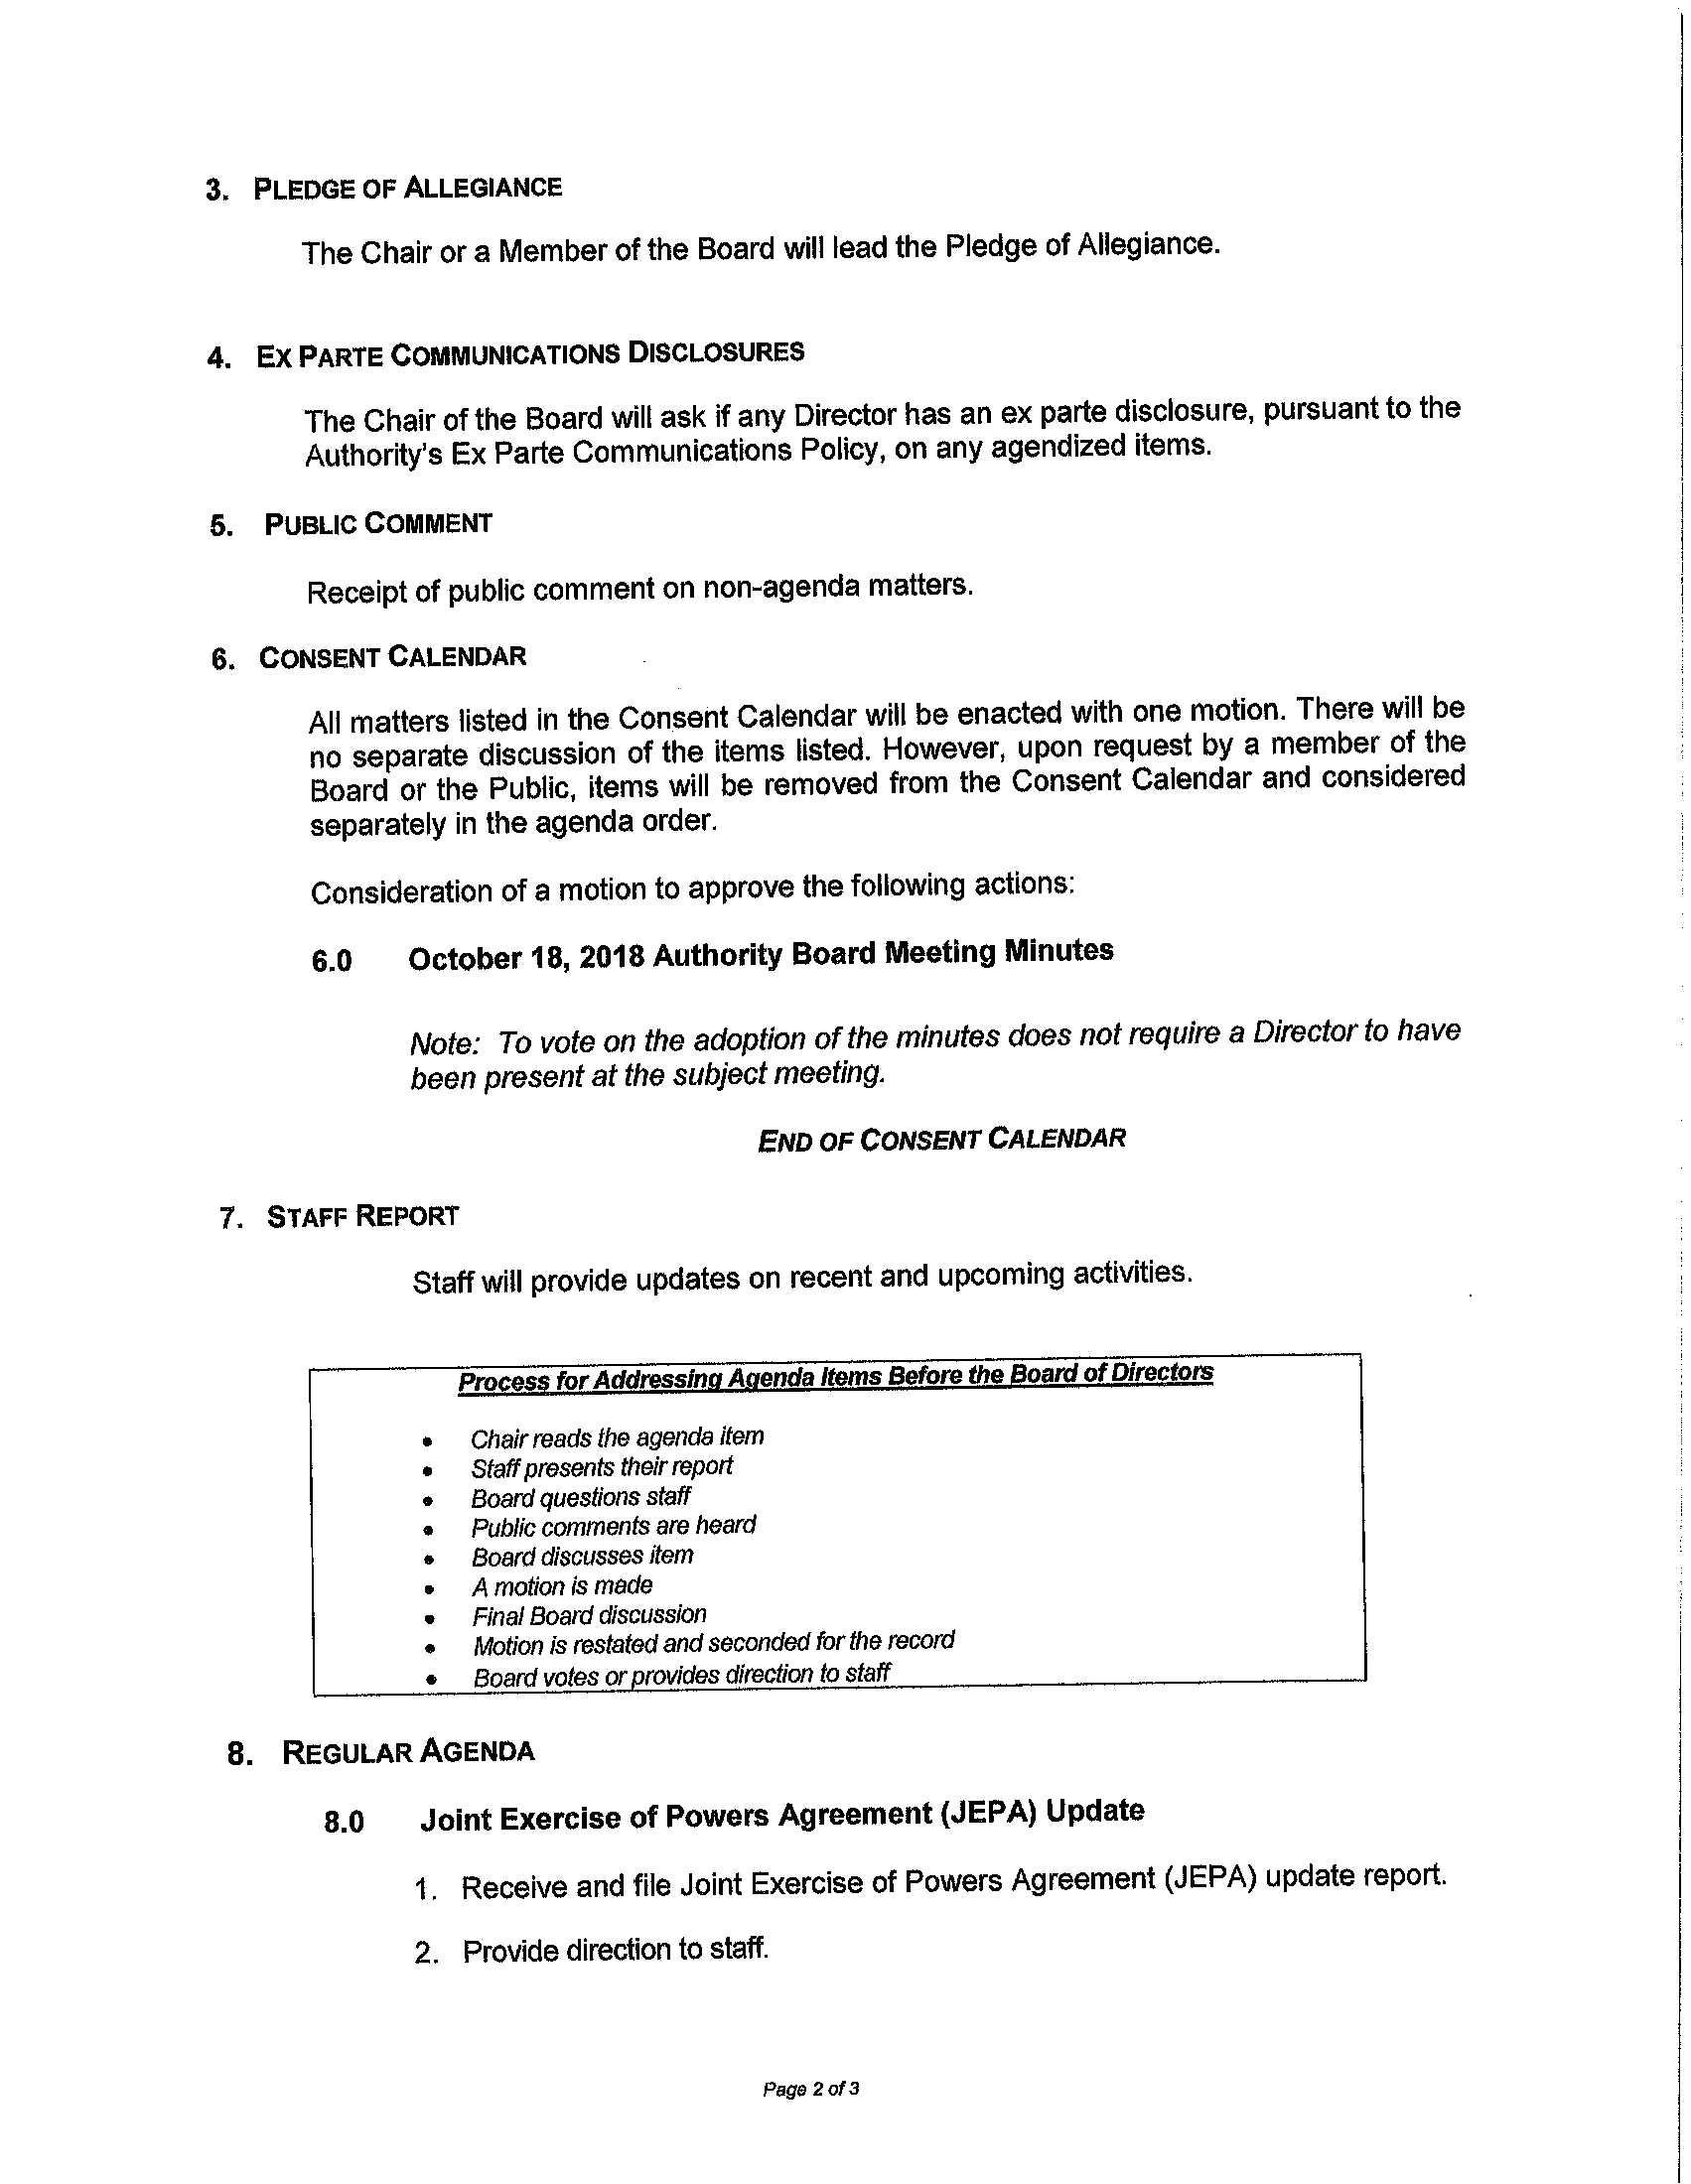 ESMAC Agenda 11.14.2018 (46 Pages)_33.jpg